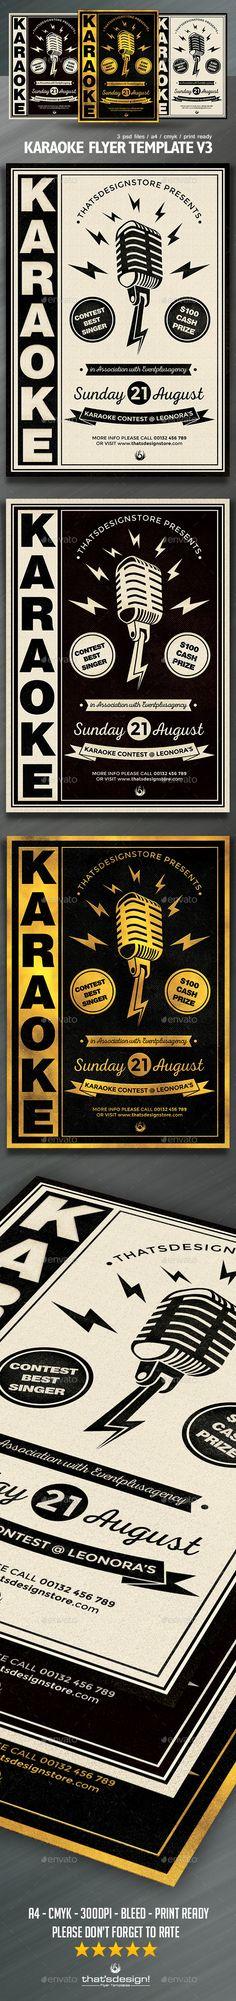 Karaoke Flyer Template PSD #design Download: http://graphicriver.net/item/karaoke-flyer-template-v3/12897018?ref=ksioks